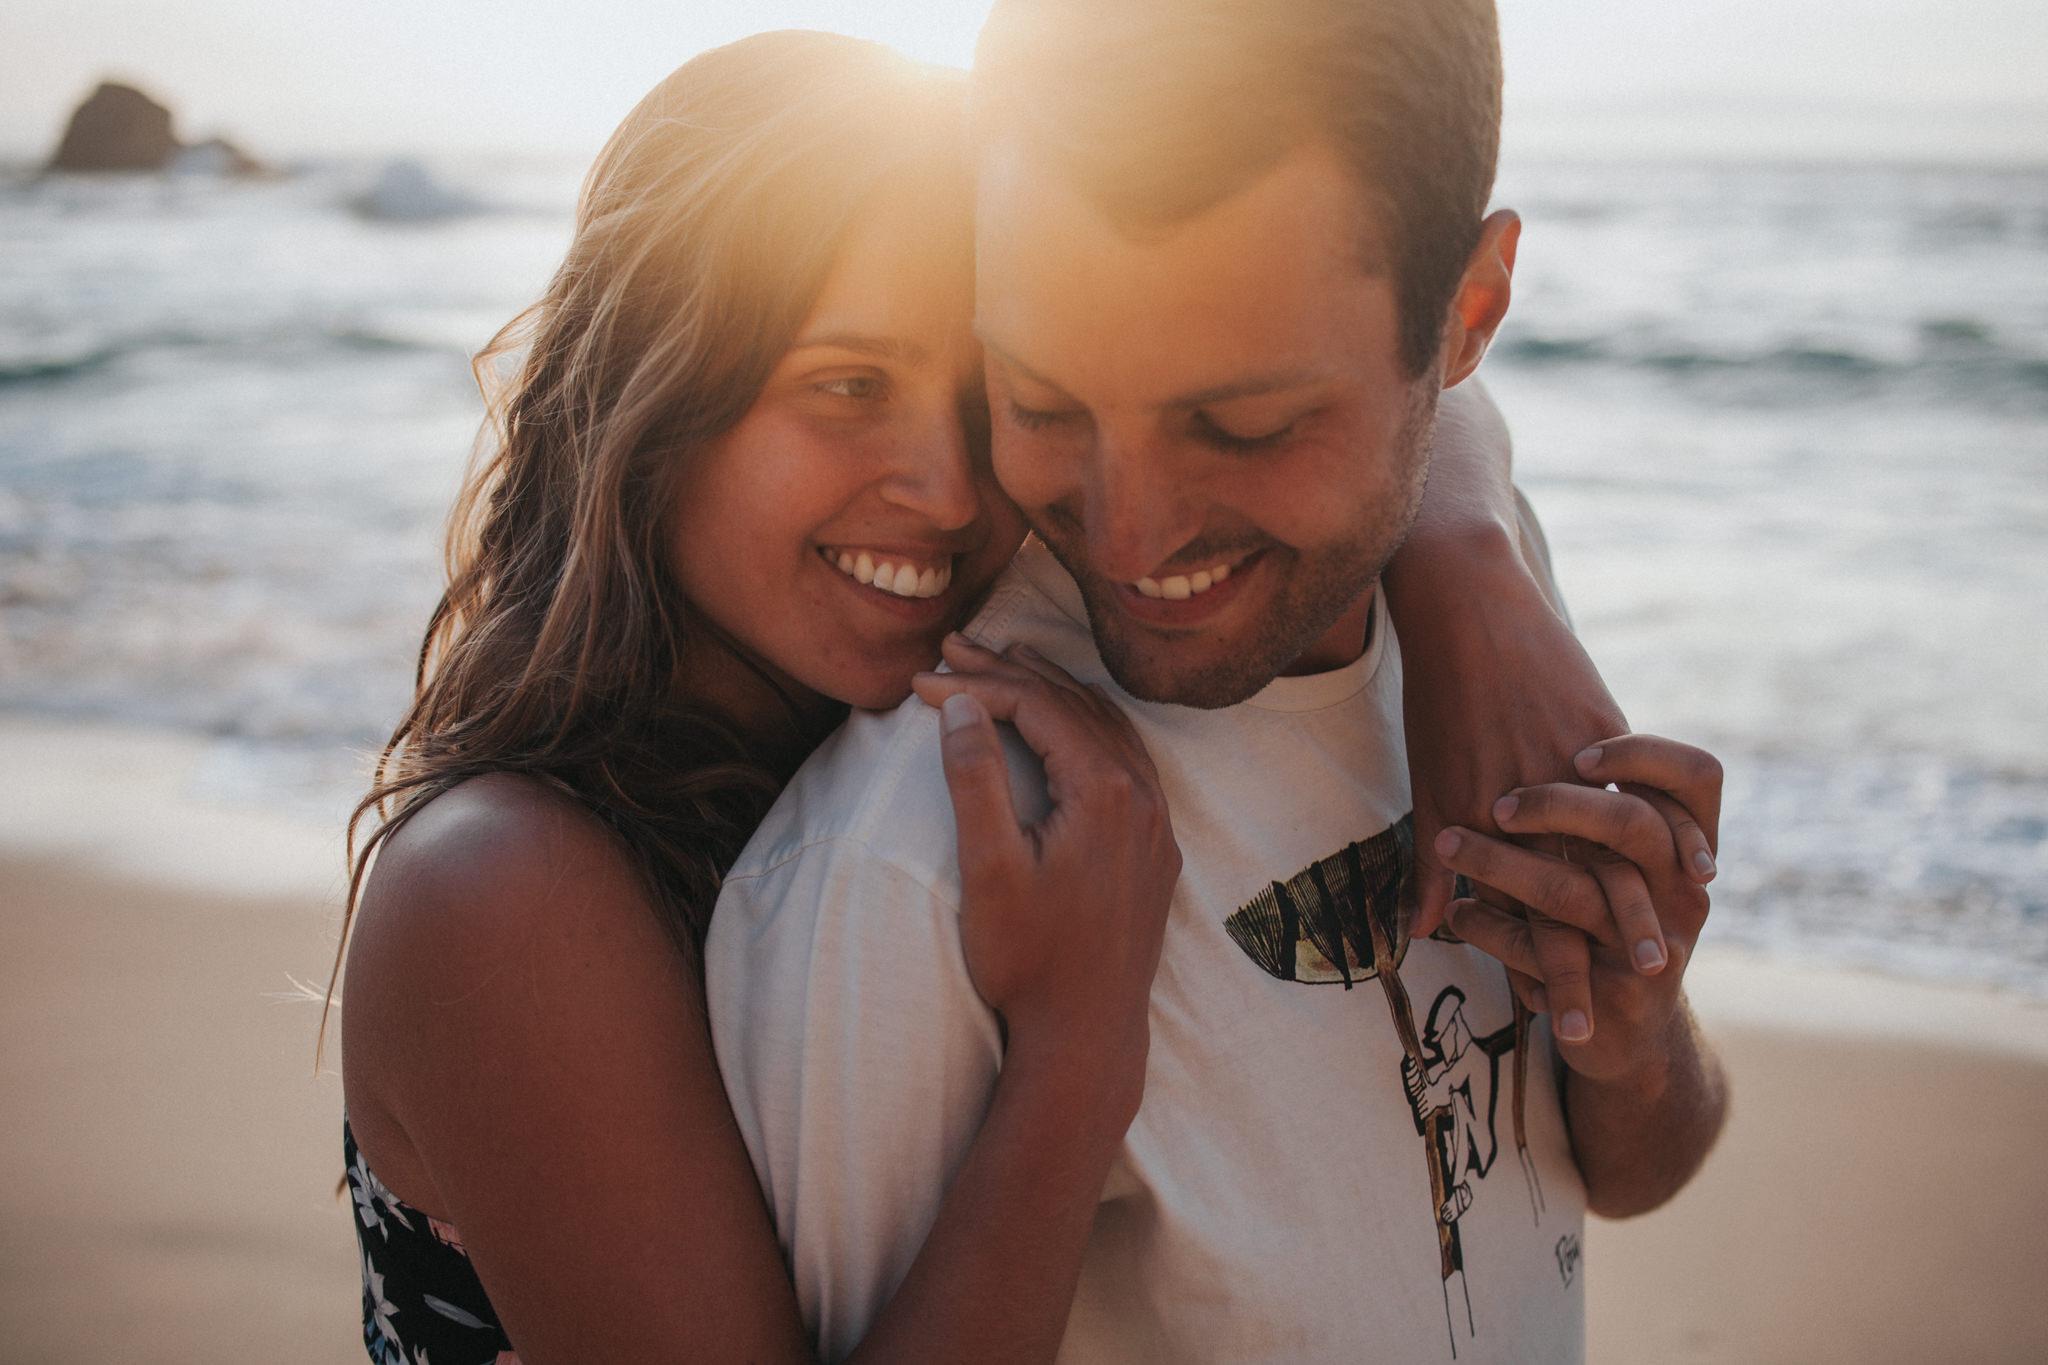 Bride and Groom smiling during the sunset at Praia da Ursa